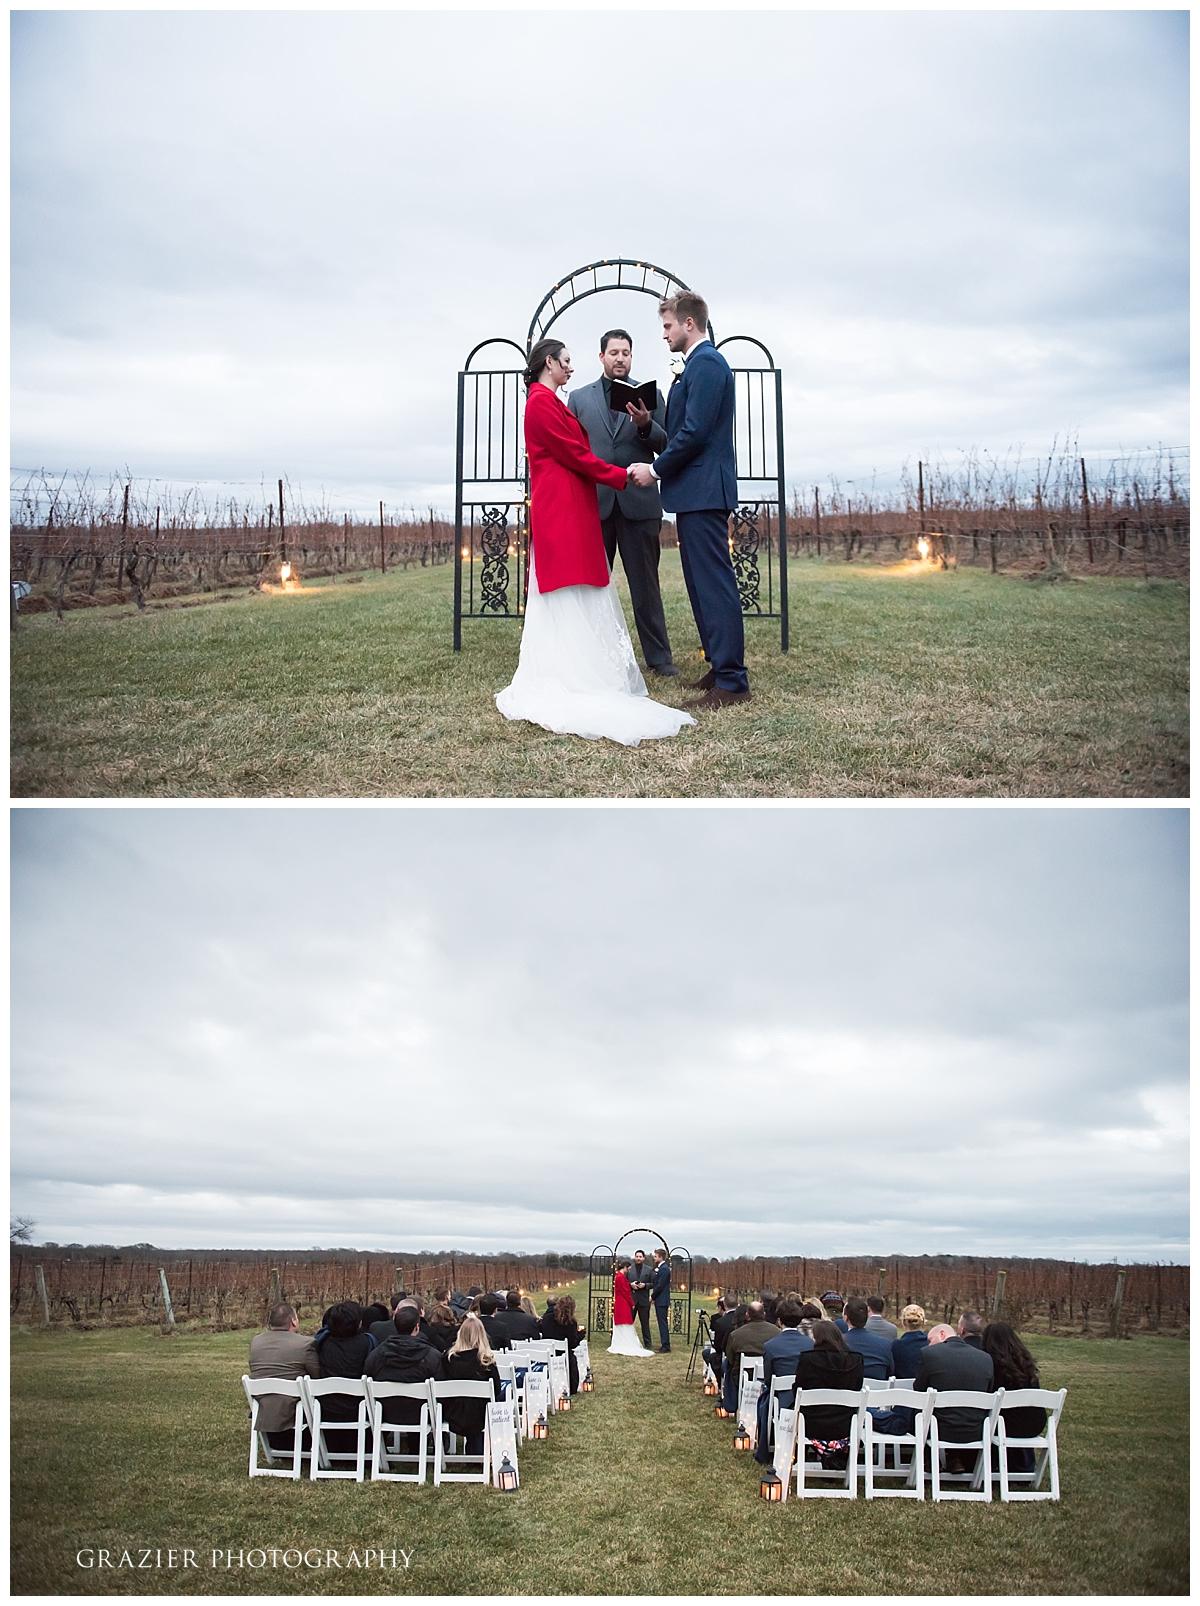 Saltwater Farm Vineyard Wedding Grazier Photography 1222-17-65_WEB.jpg